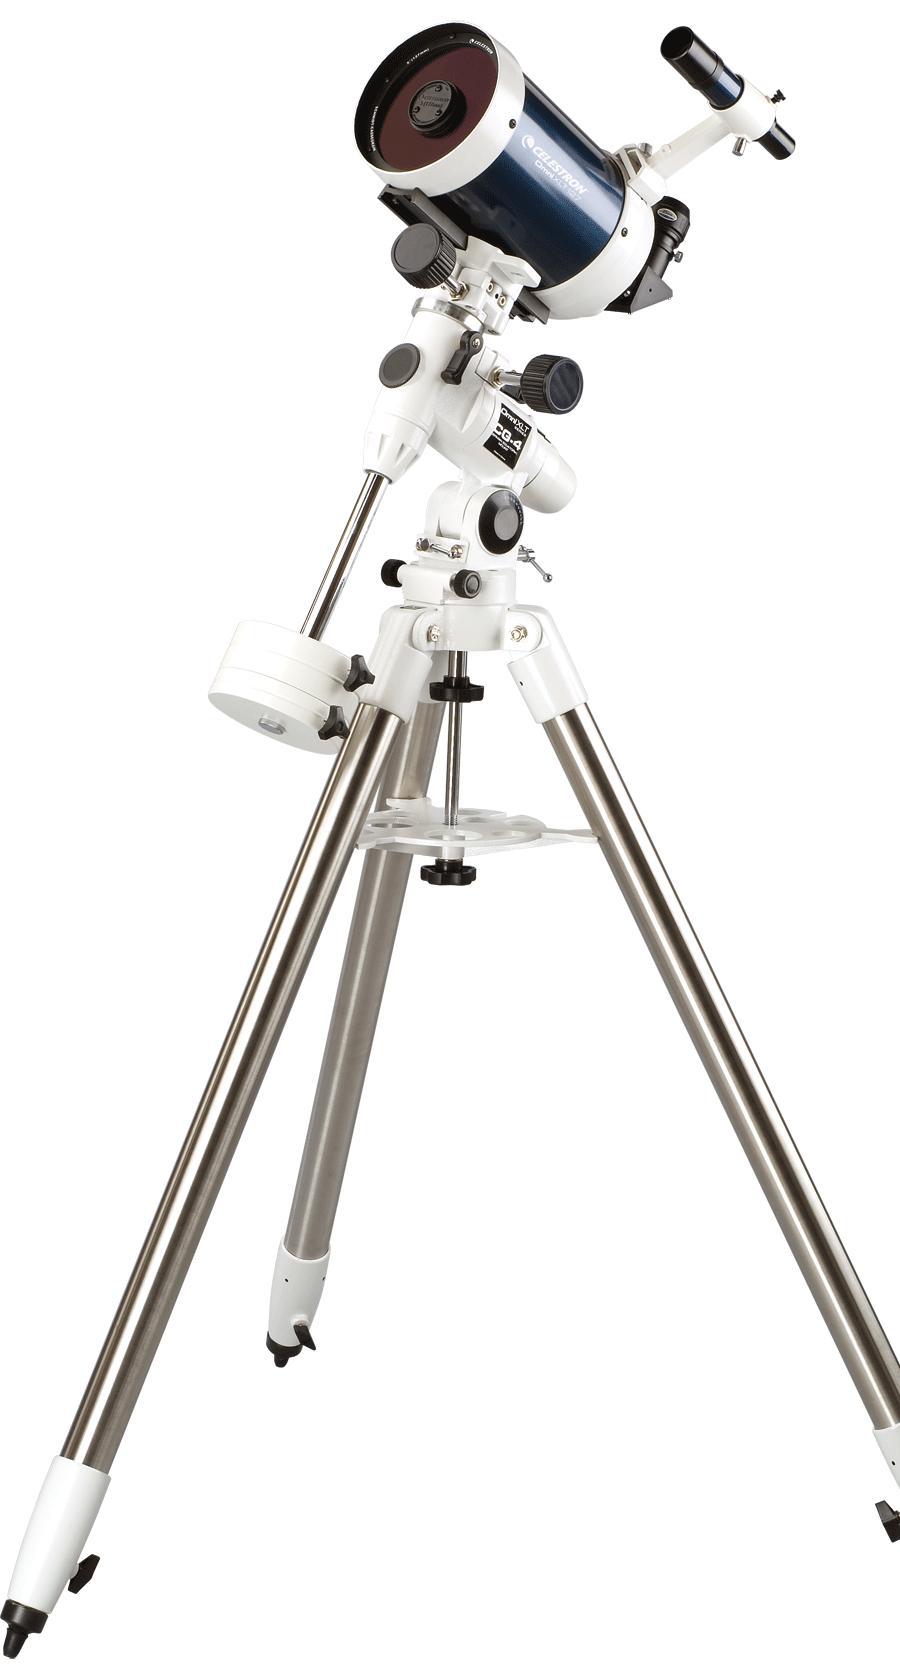 Celestron Omni XLT 127 SCT Reflector Telescope